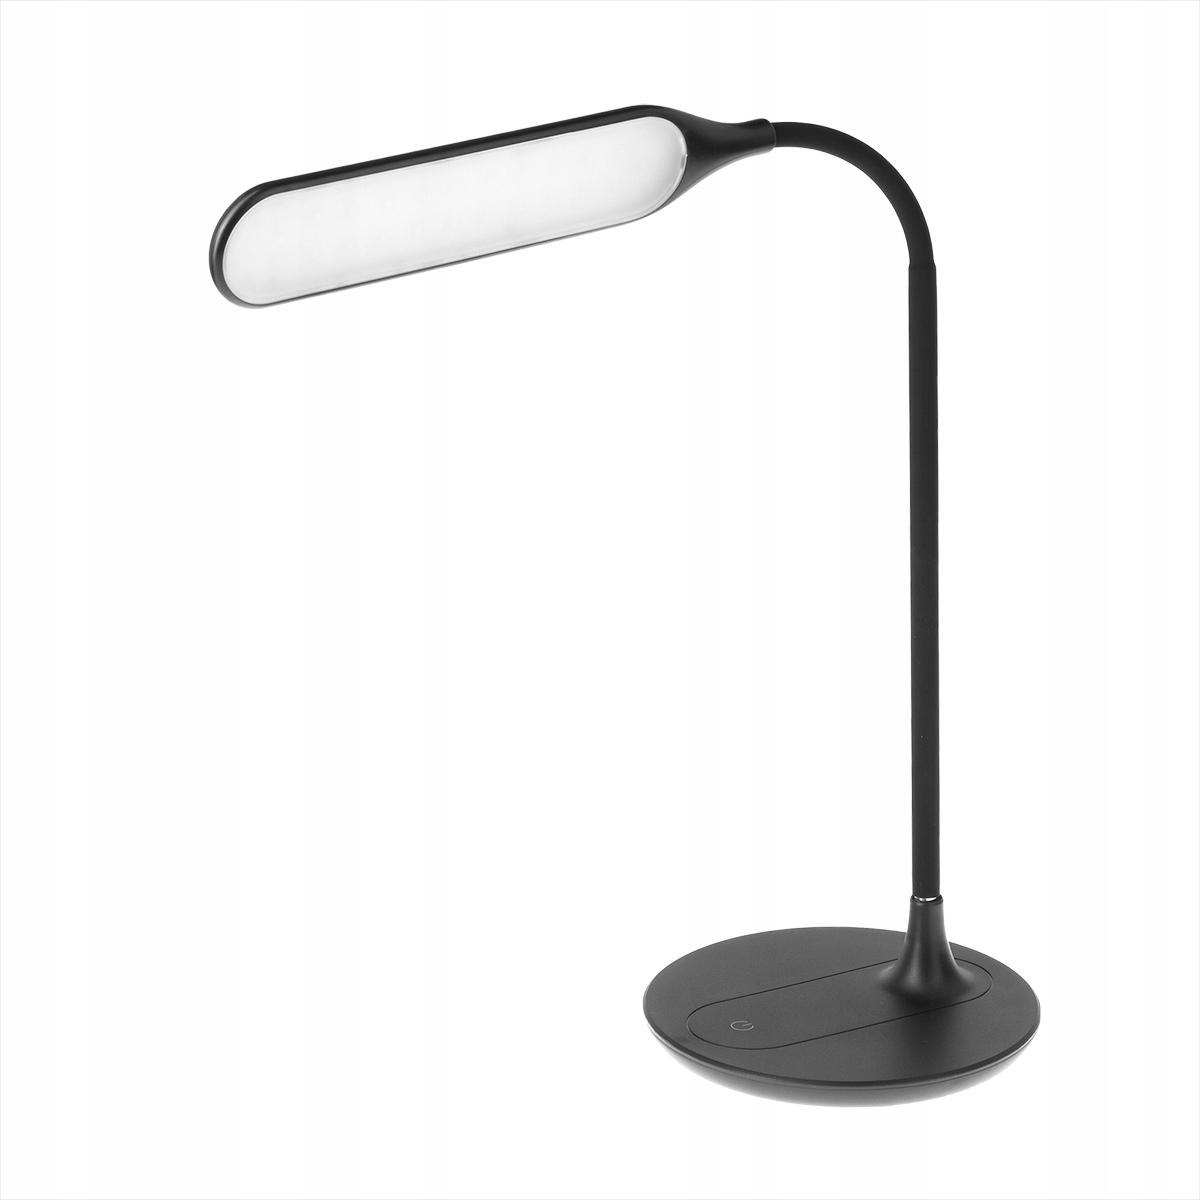 LAMPA LED NA BIURKO MANICURE 6W CZARNA GIĘTKA DS51